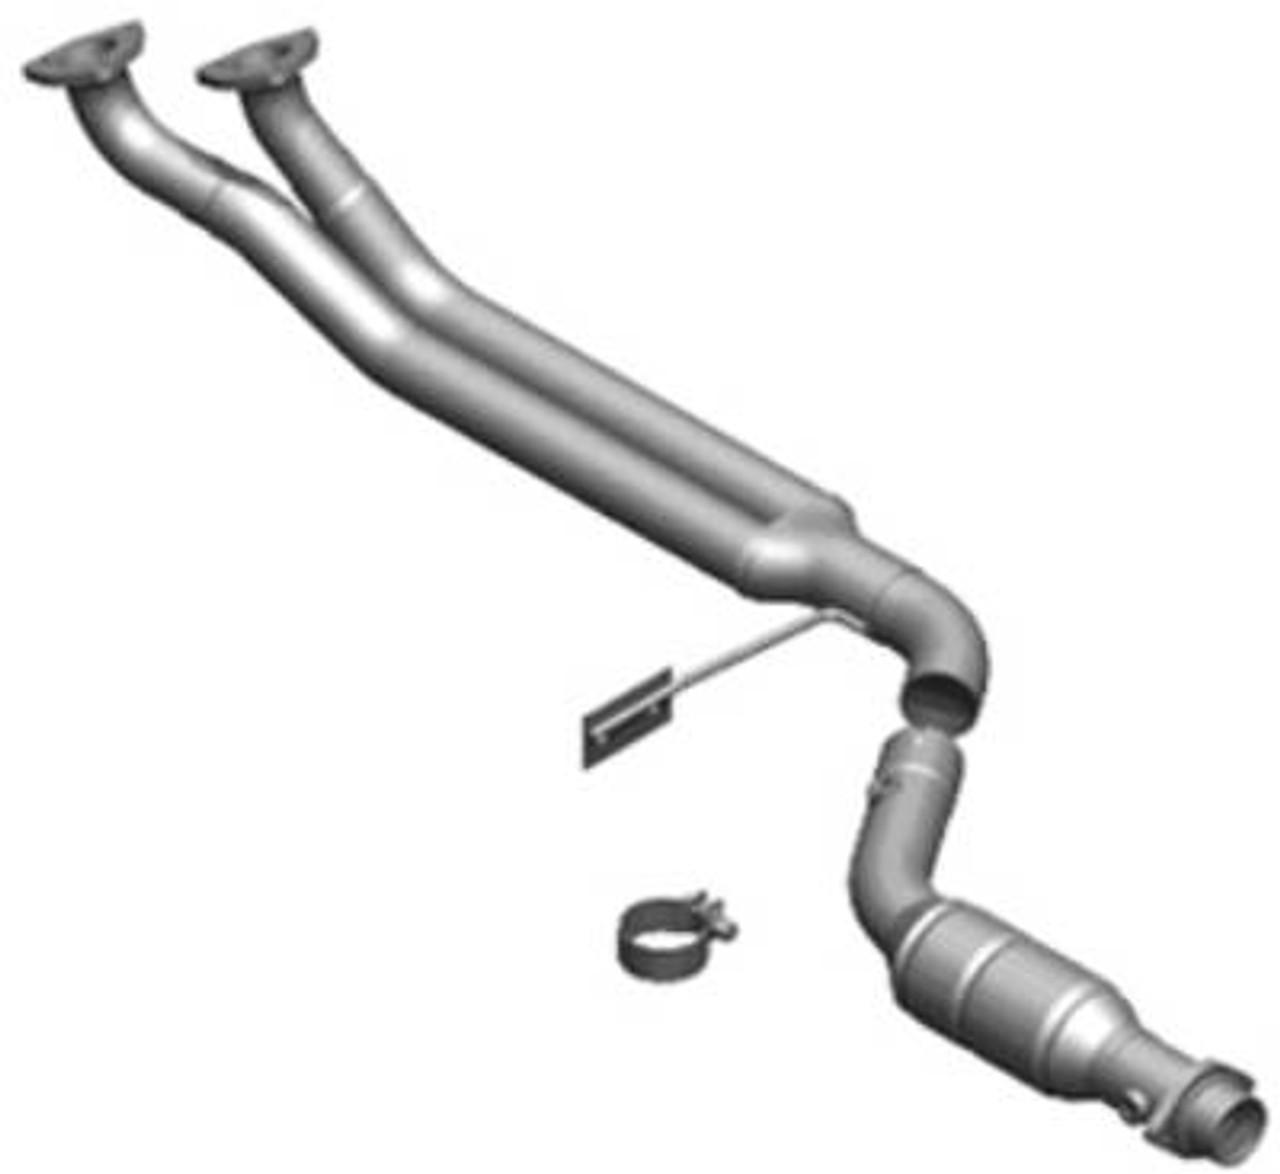 Magnaflow Catalytic Converter For 1997 98 Bmw Z3 2 8l E36 7 23992